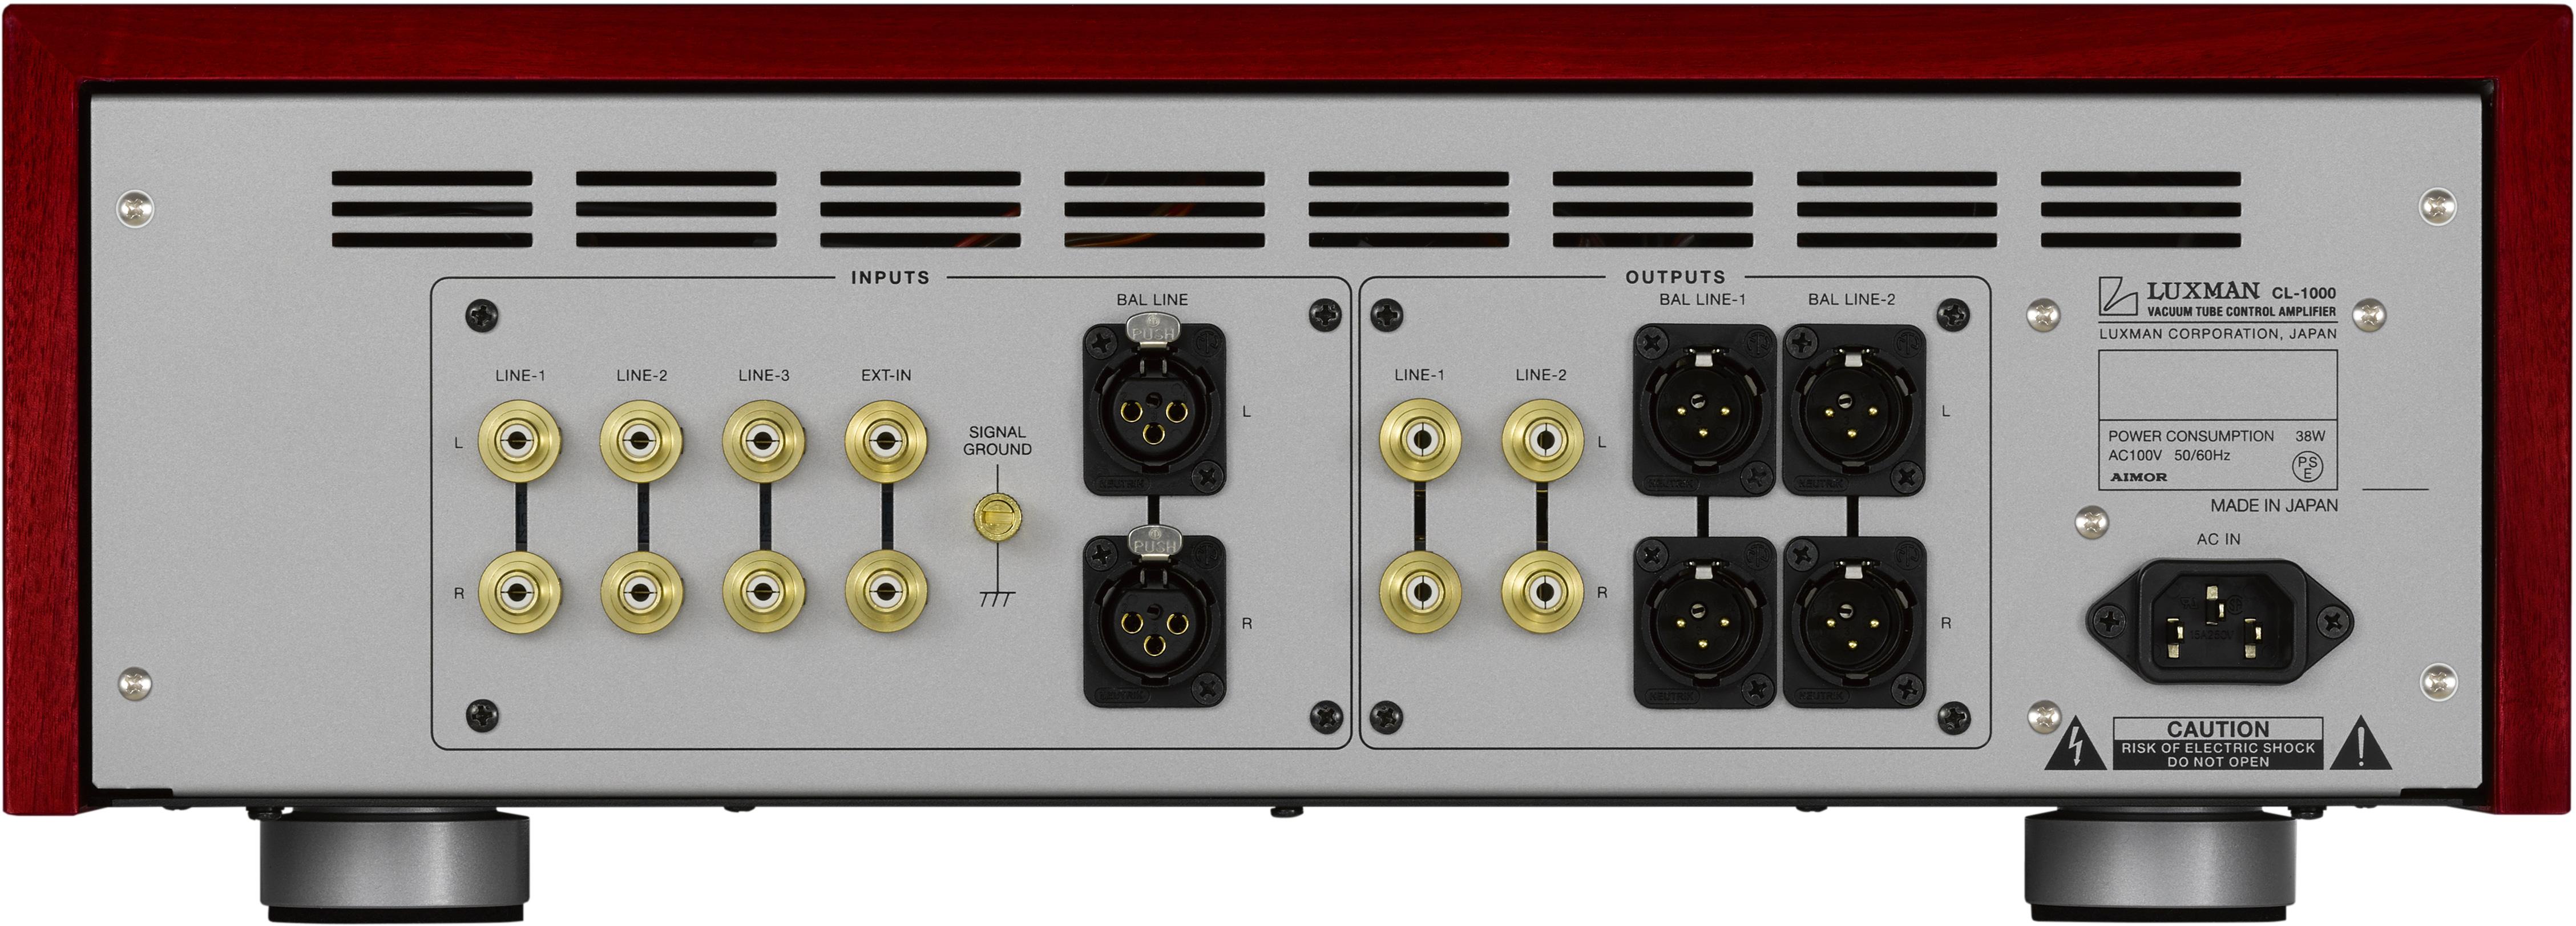 Luxman launches new flagship control amplifier CL-1000 - Dagogo